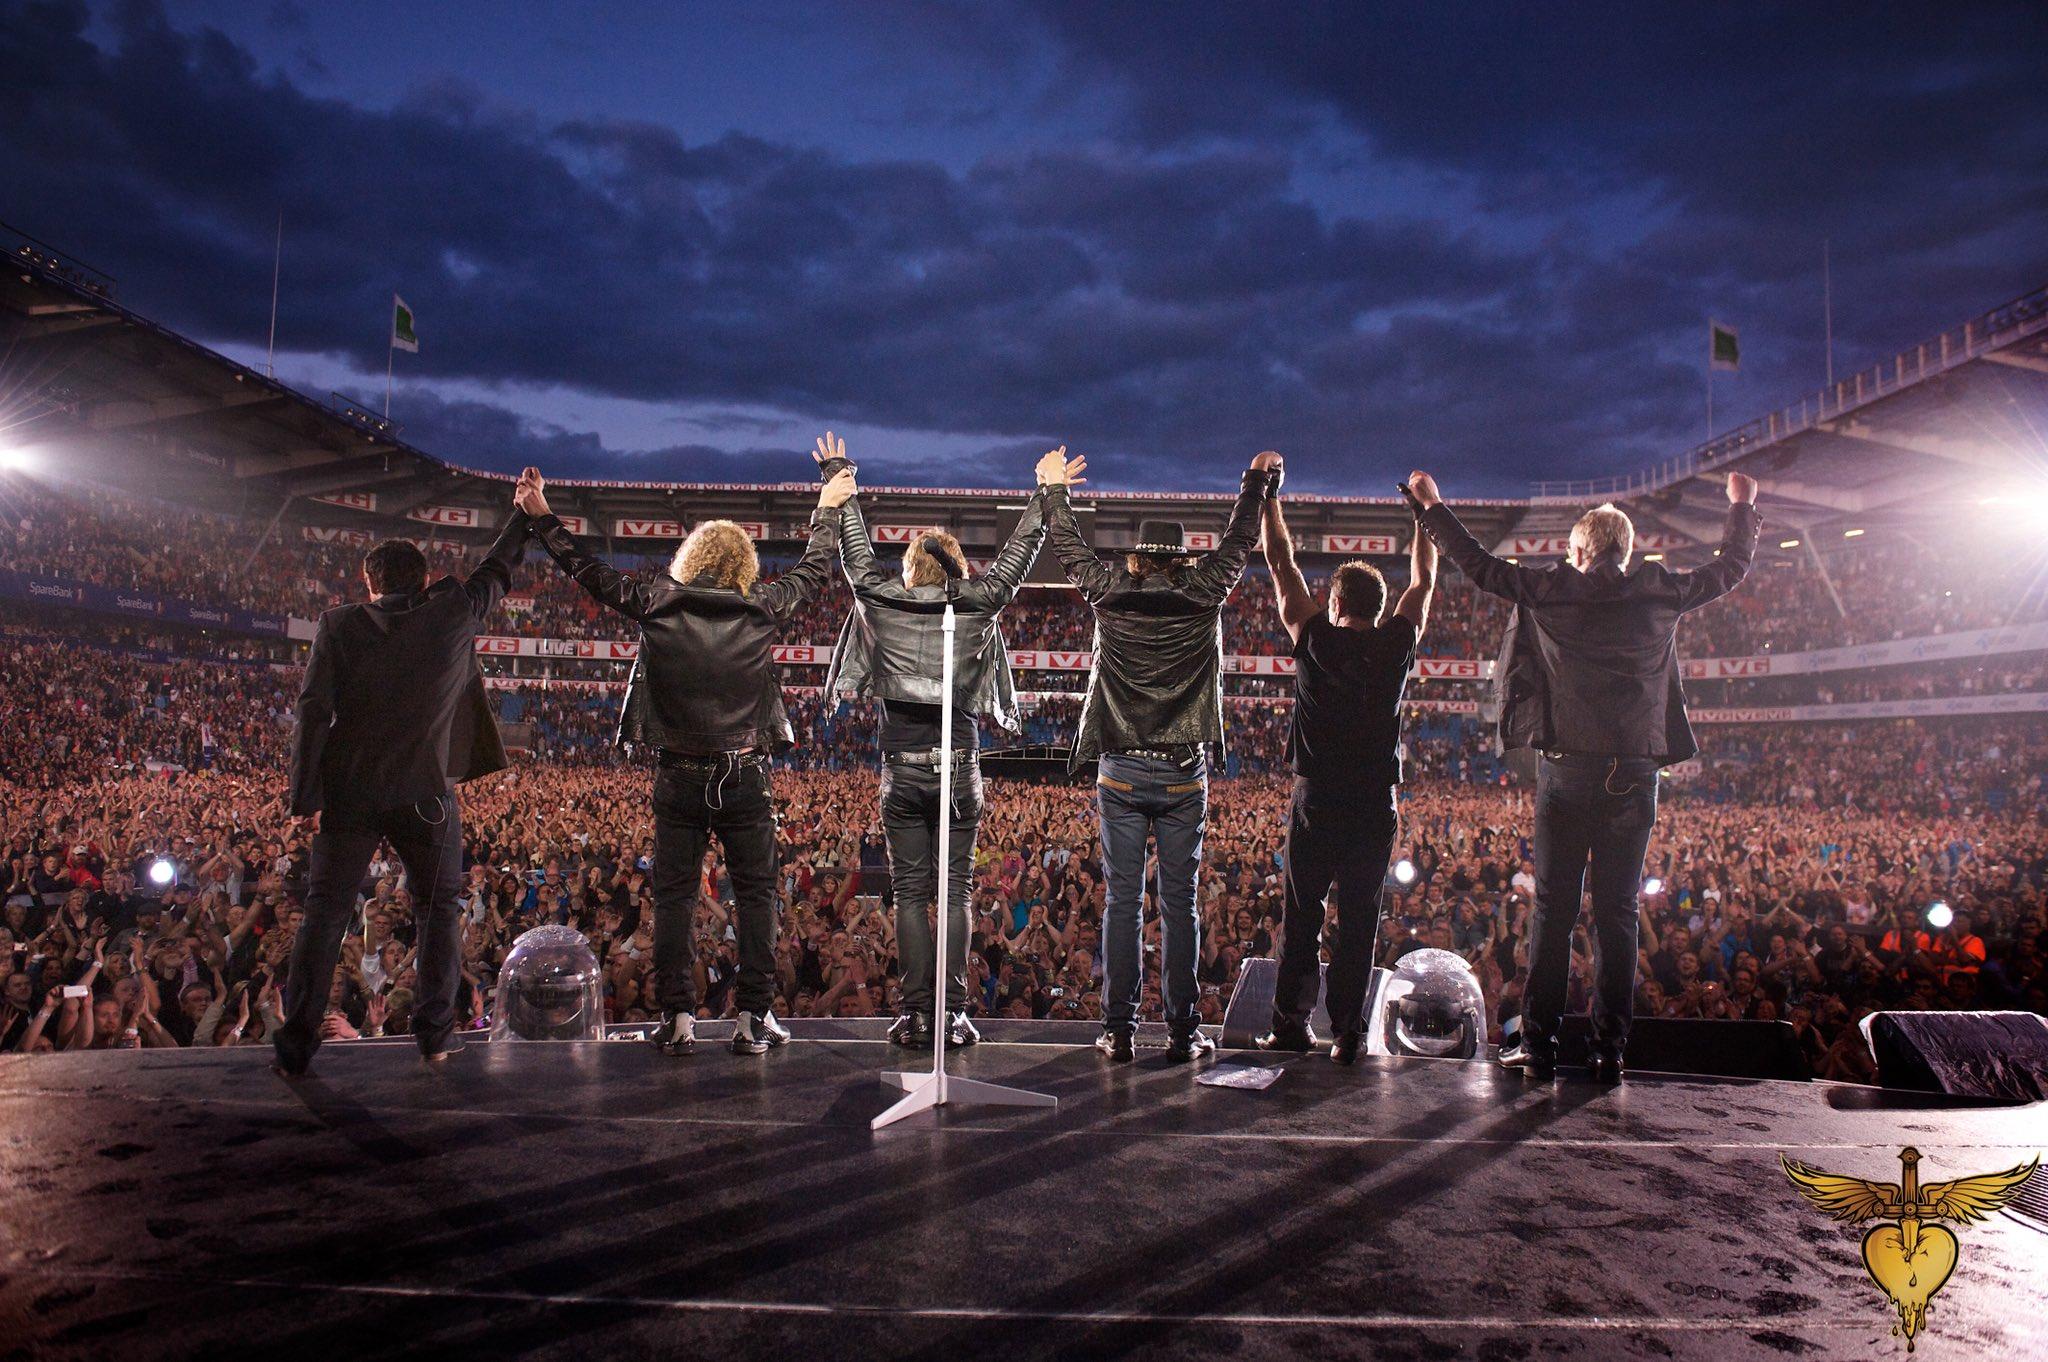 Next up, @rockhall! Use #BonJoviRockHall to share your favorite photos and memories of the band. ��: @davidbergman https://t.co/9lwgEKK2iZ